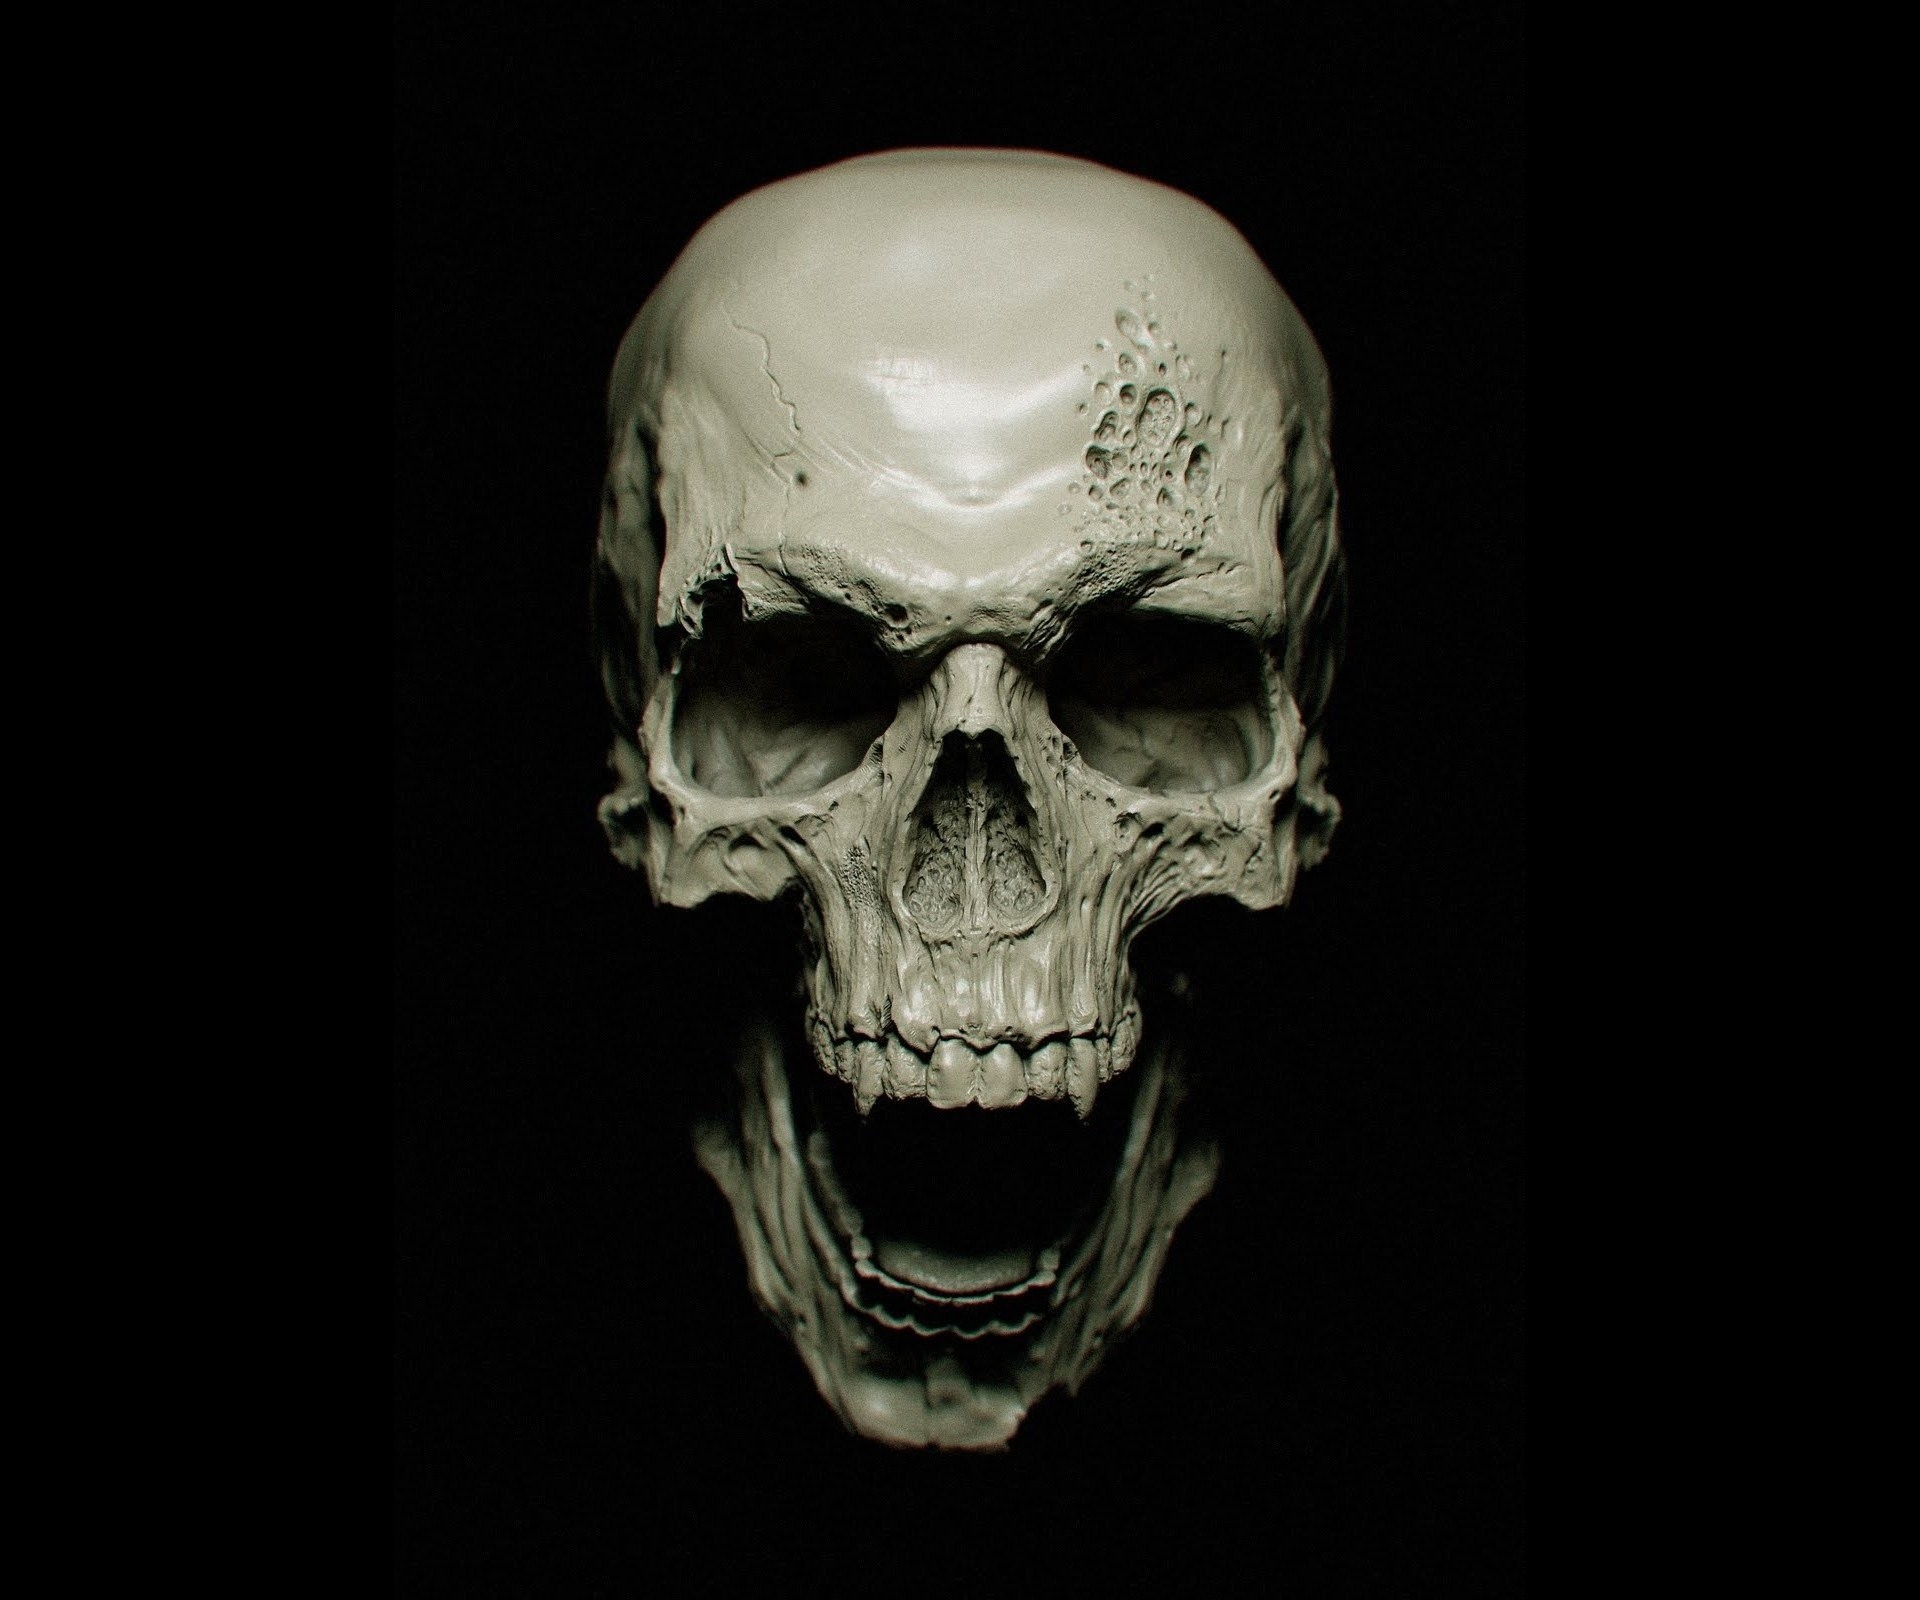 Skull Black Background ·① WallpaperTag